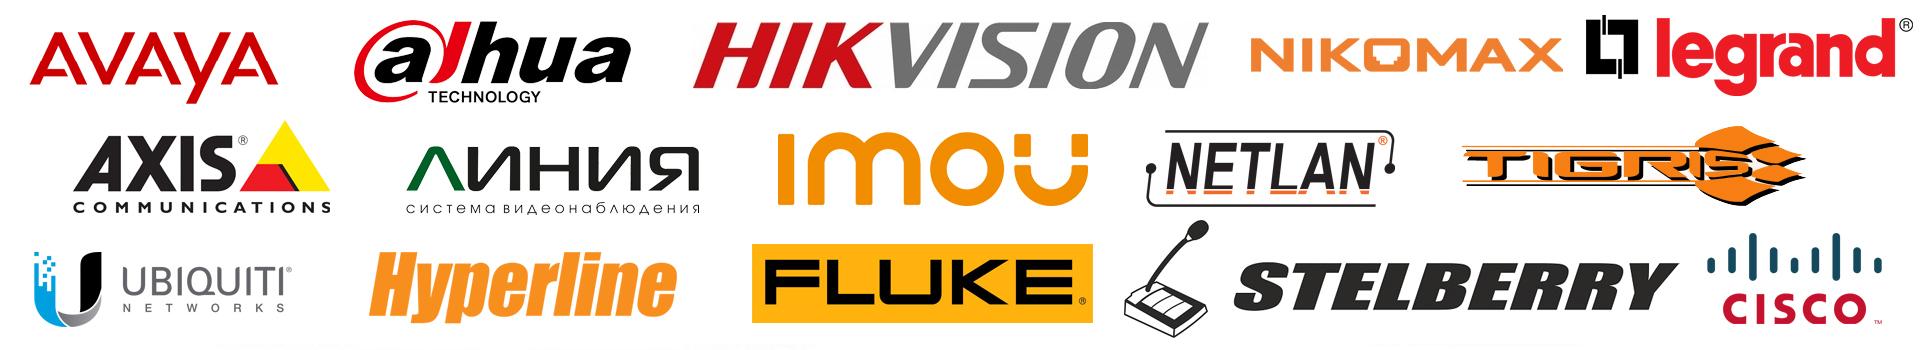 бренд axis dahua hikvision nikomax legrand avaya hyperline itv netlan tigris ubiquiti fluke линия lenovo cisco